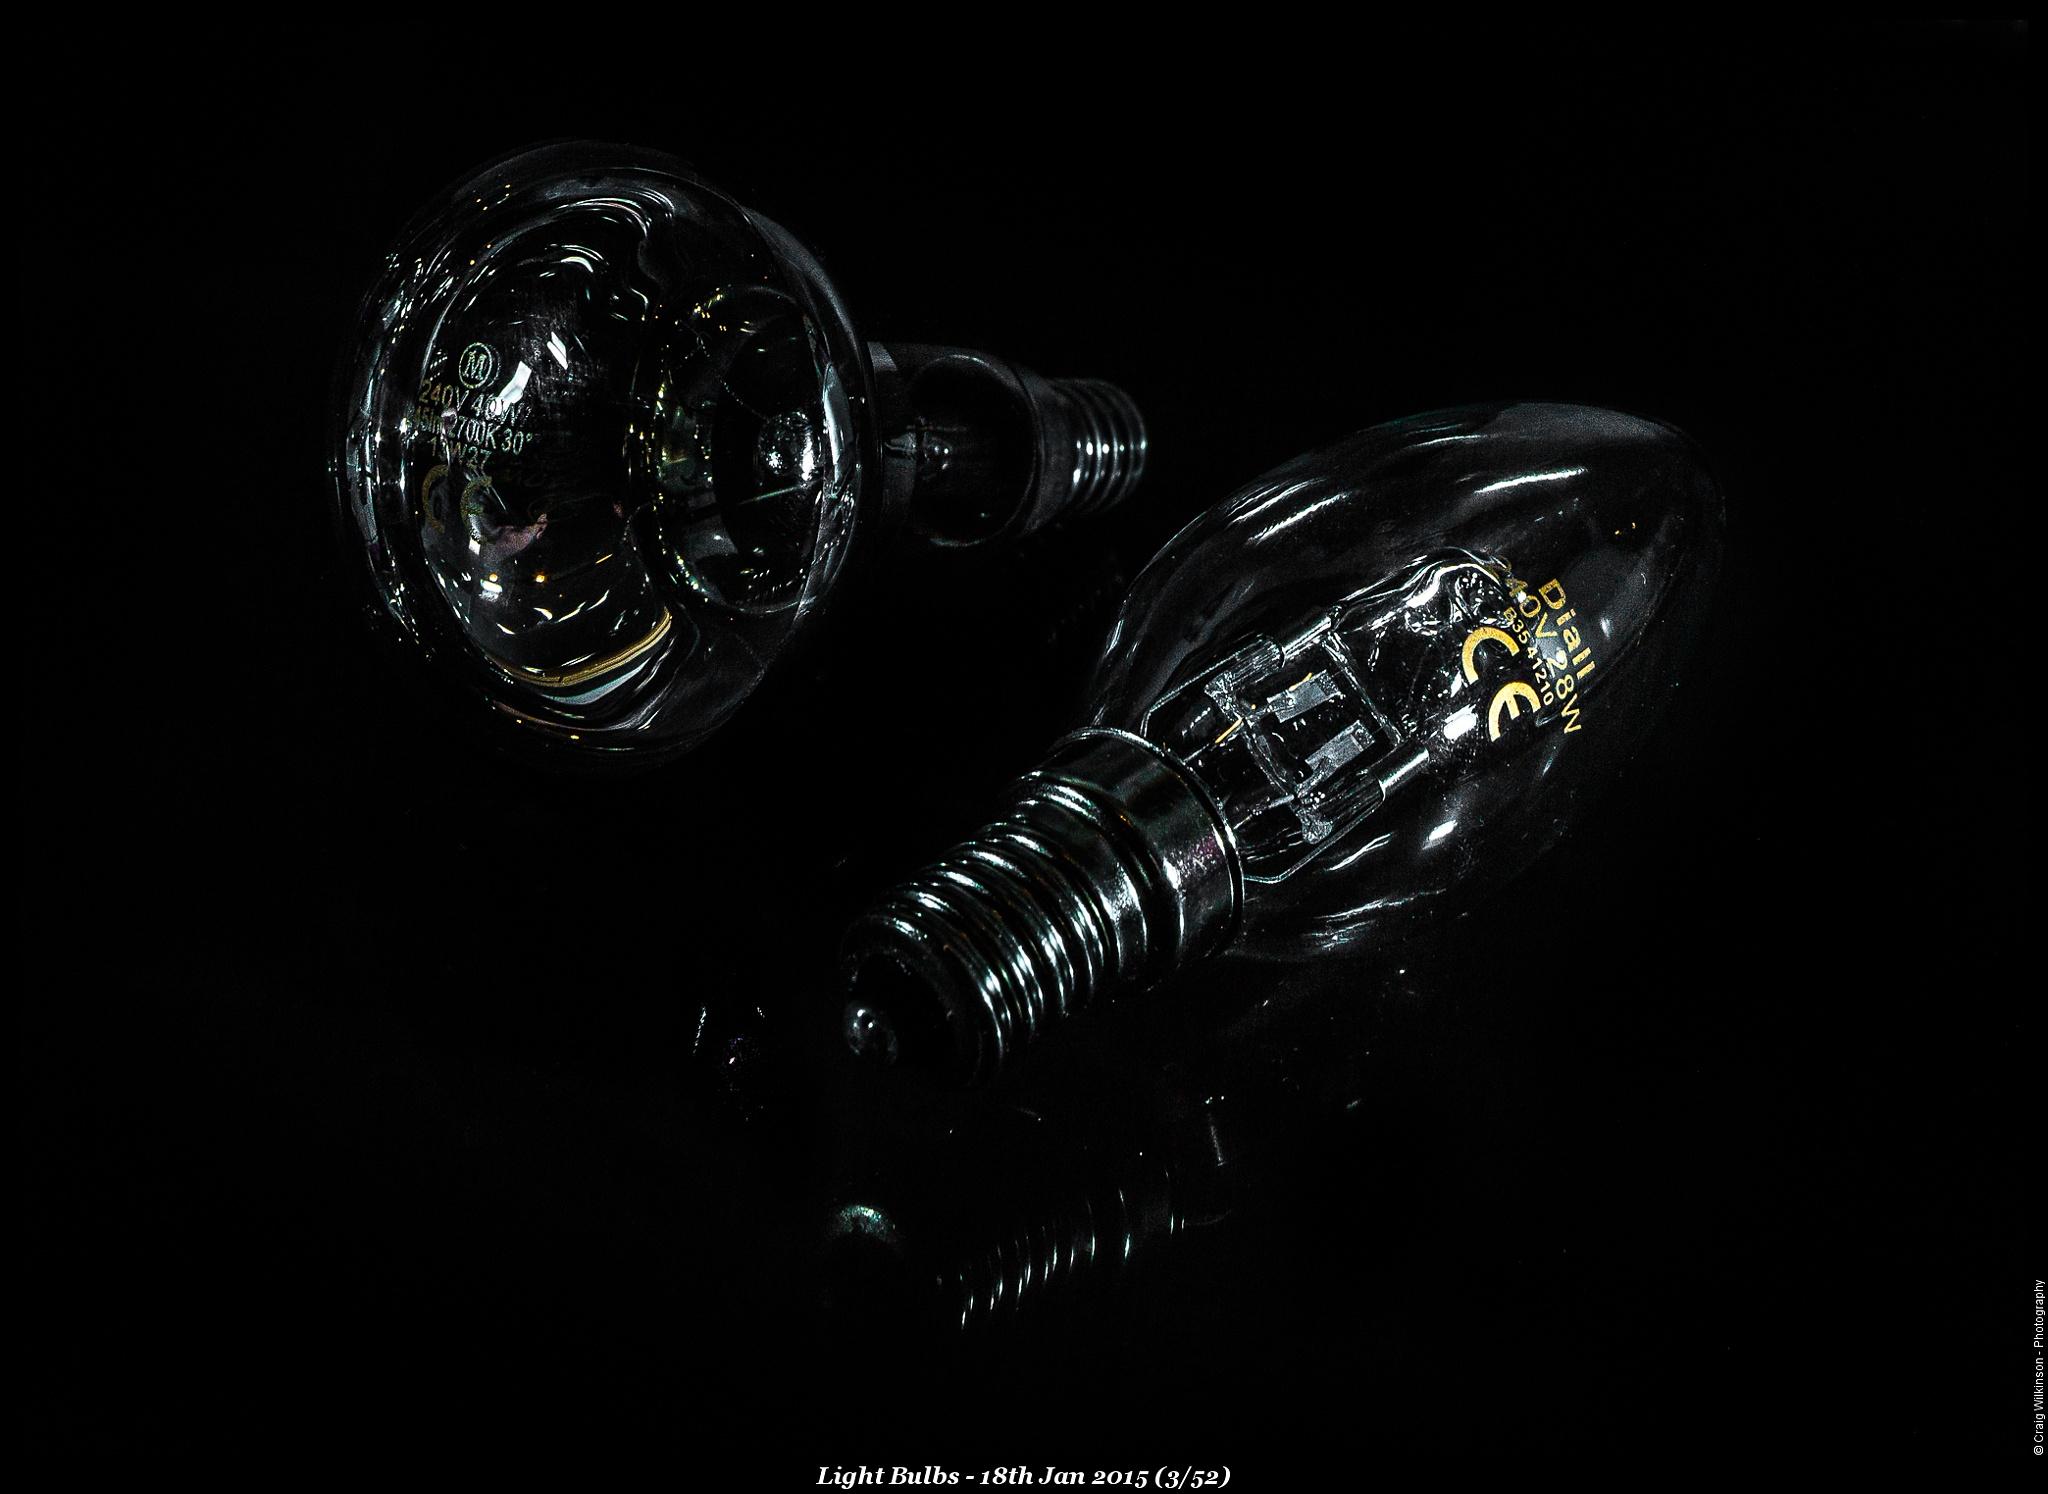 Lightbulbs by Craig Wilkinson